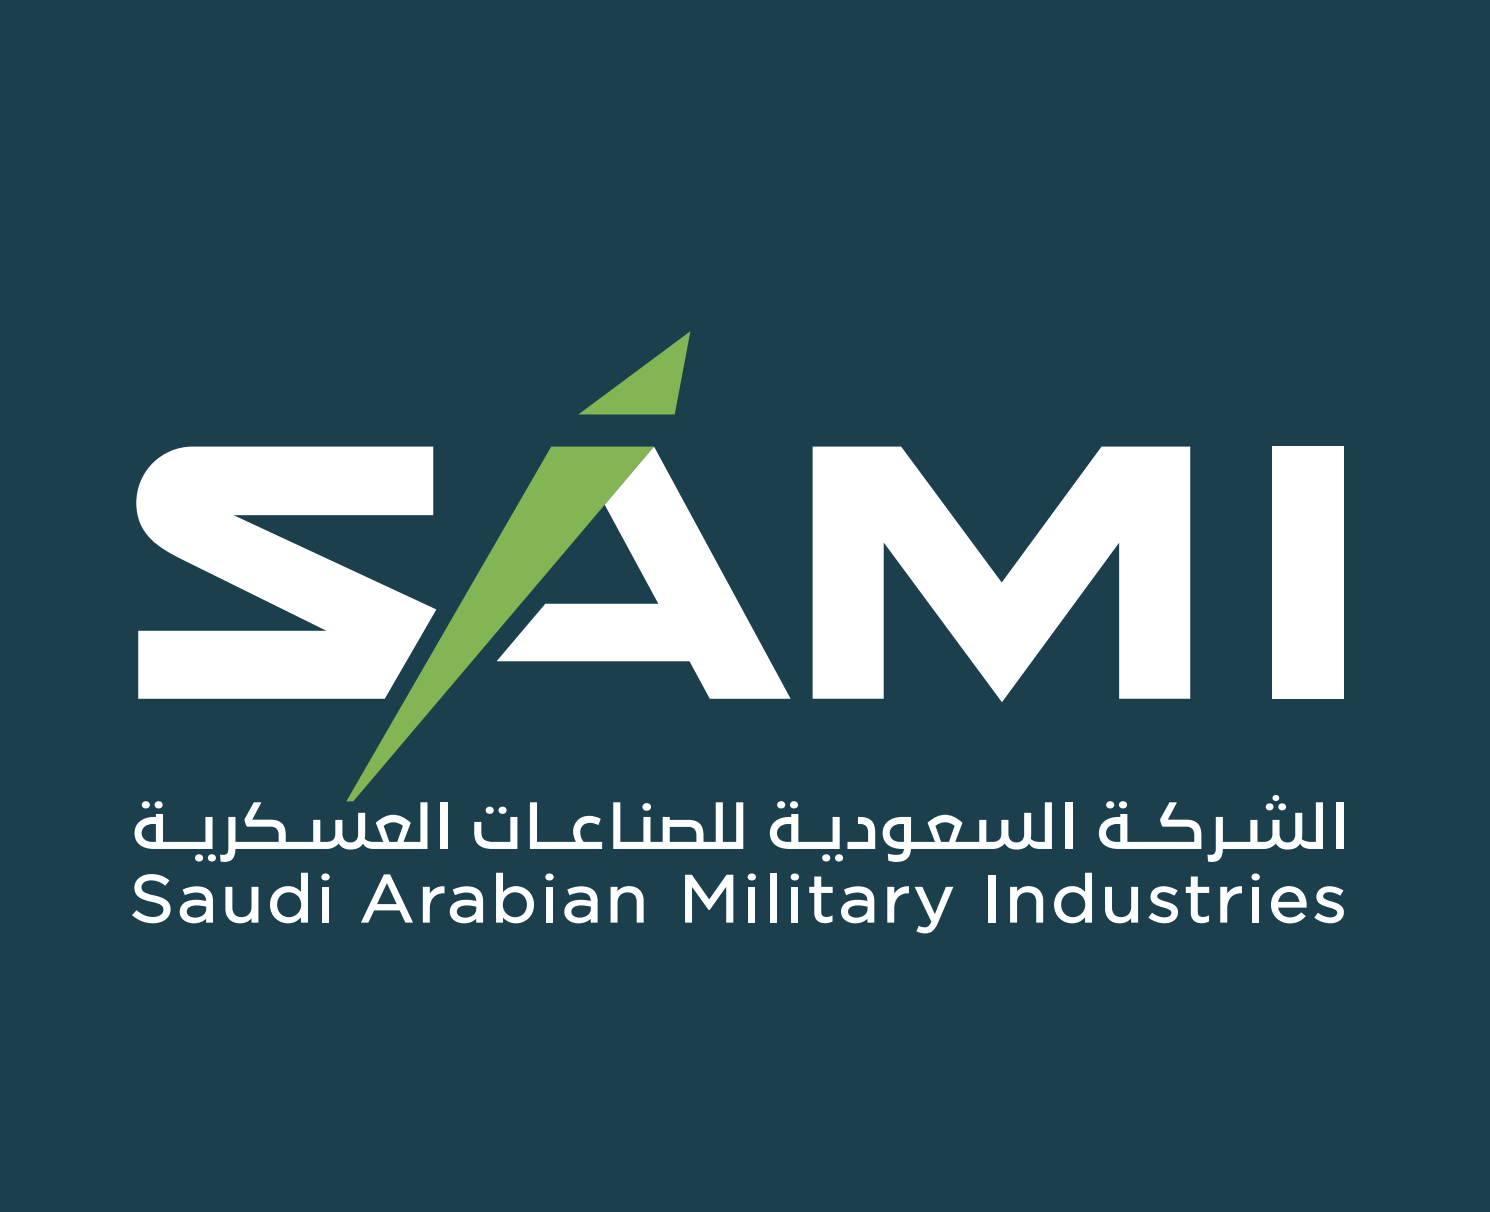 Saudi Arabian Military Industries (SAMI) Logo